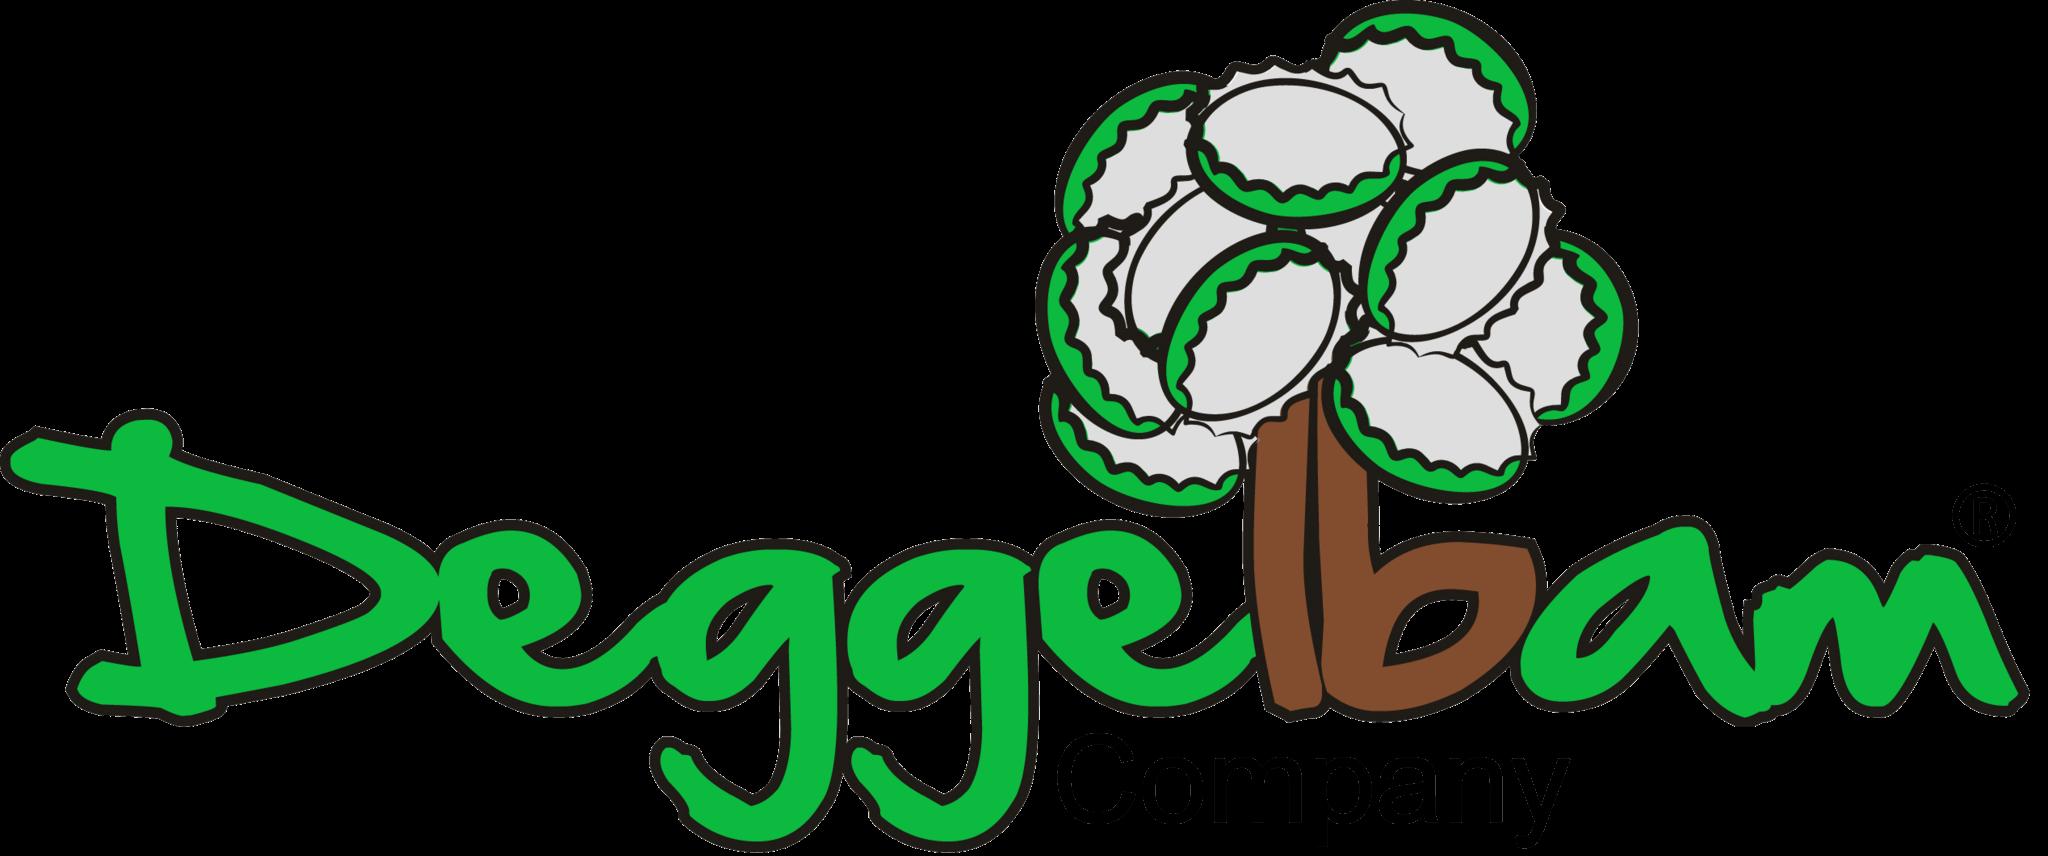 deggelbamcompany-gross-logo-klein